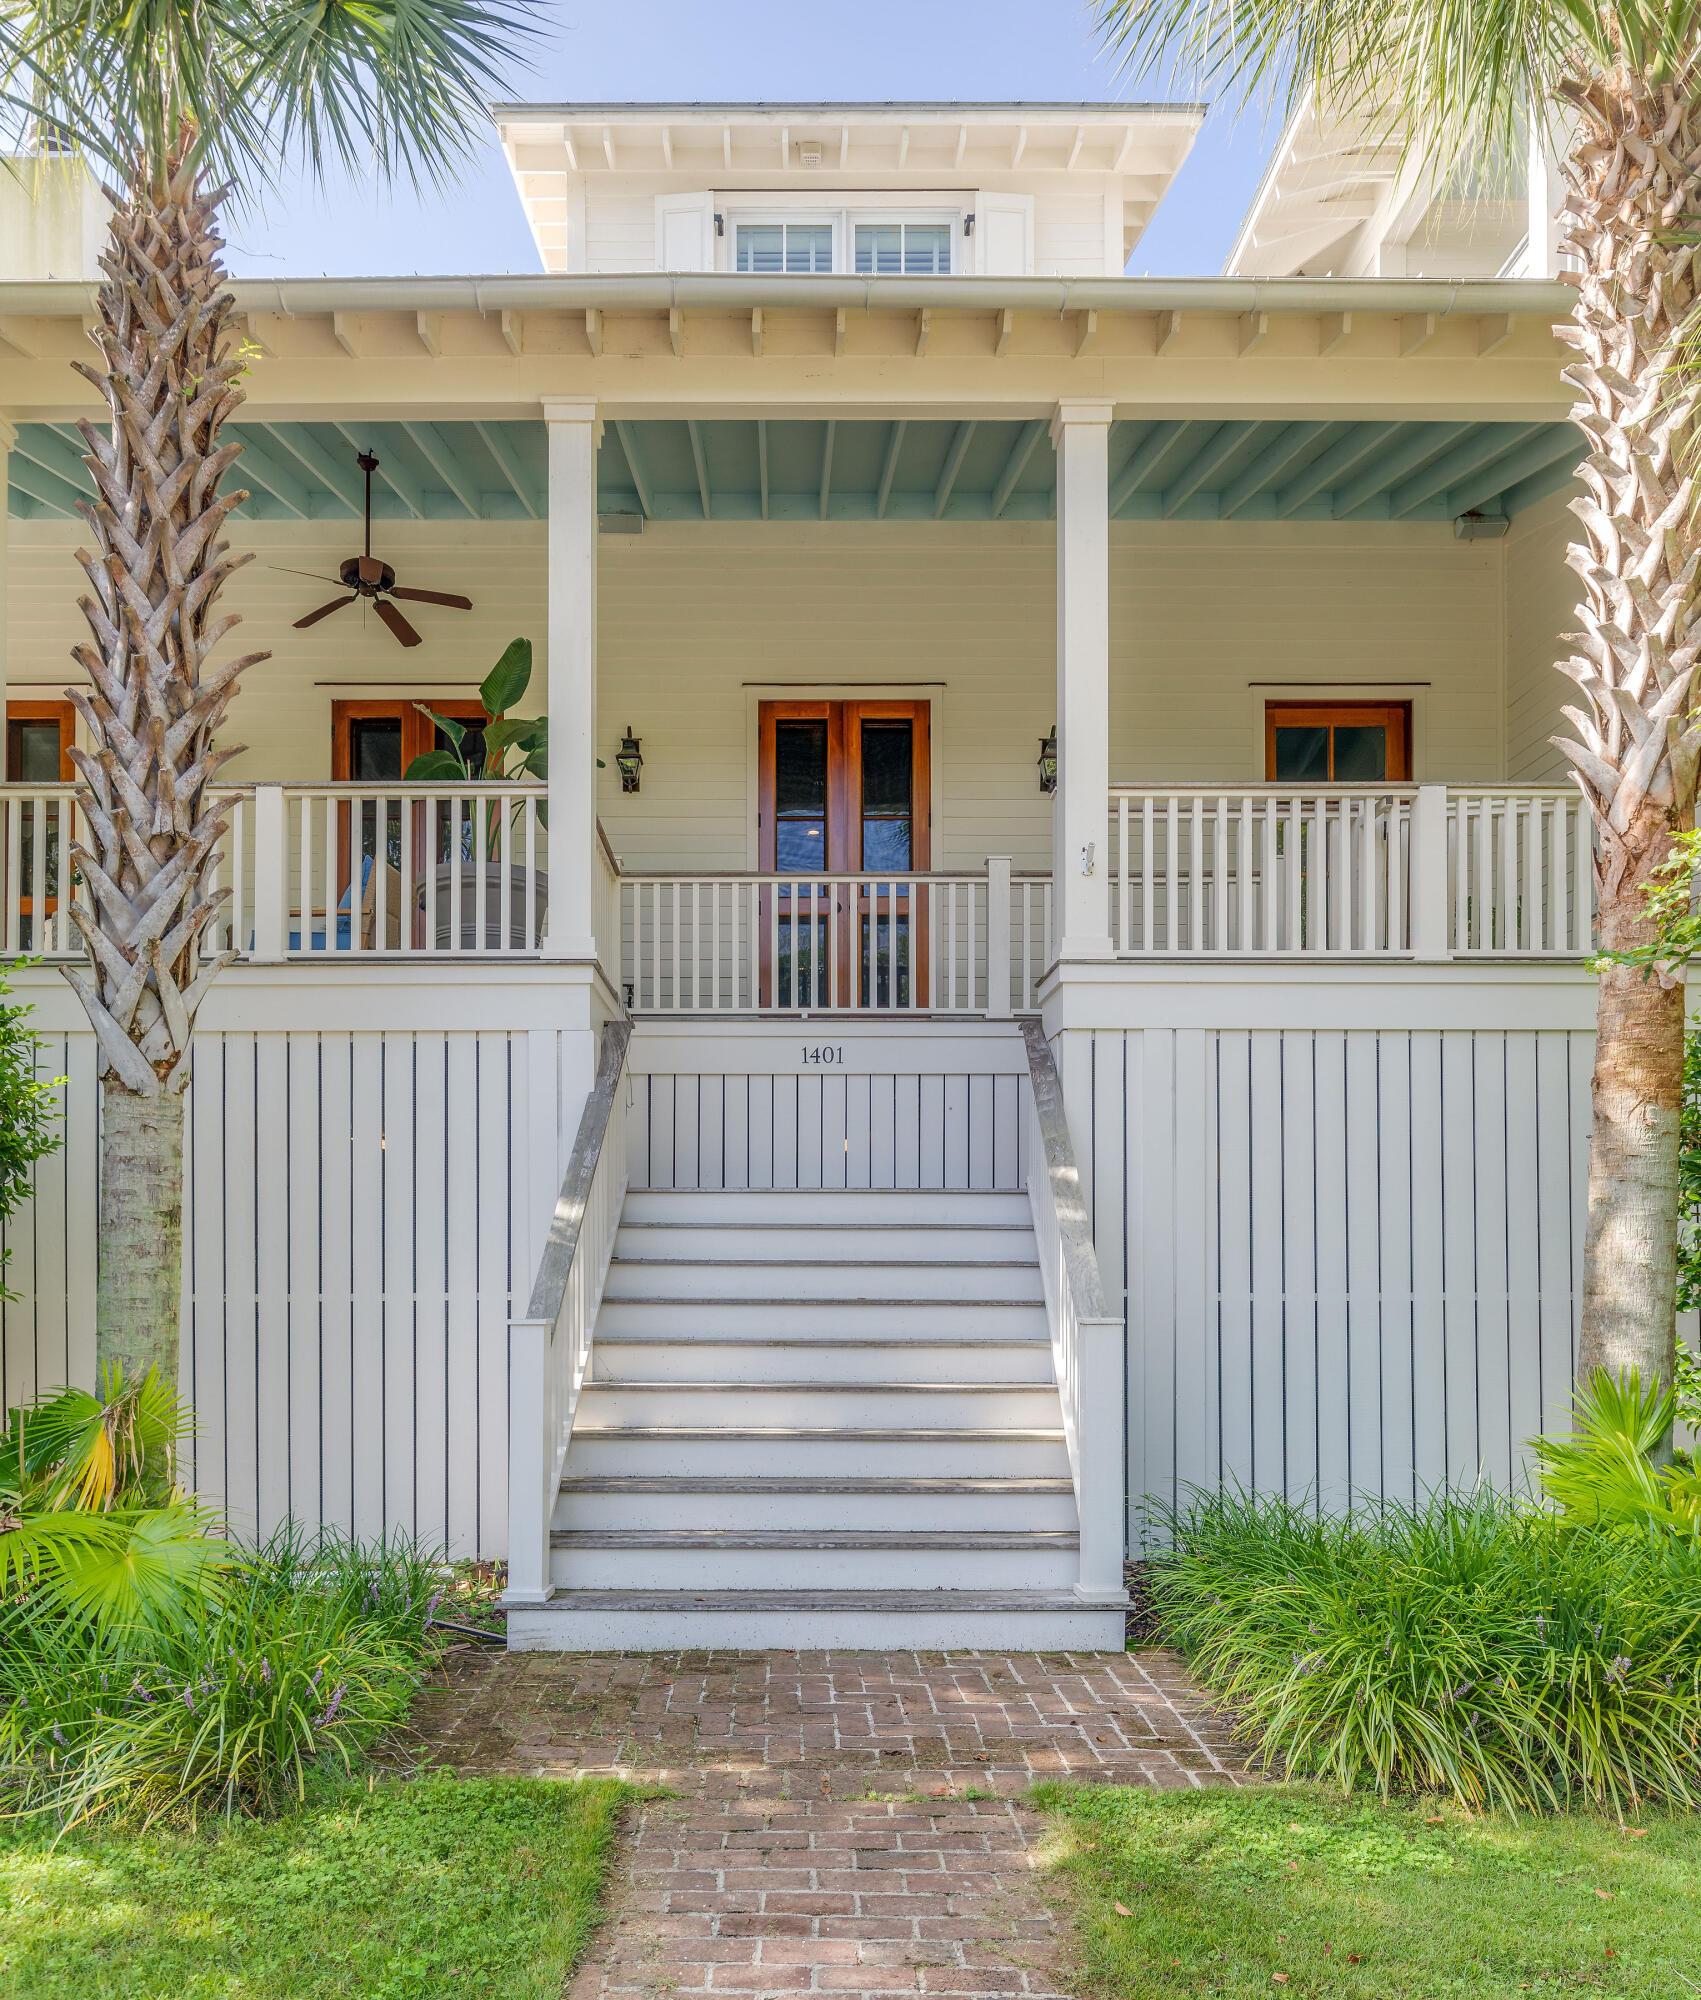 None Homes For Sale - 1401 Thompson Avenue, Sullivans Island, SC - 10